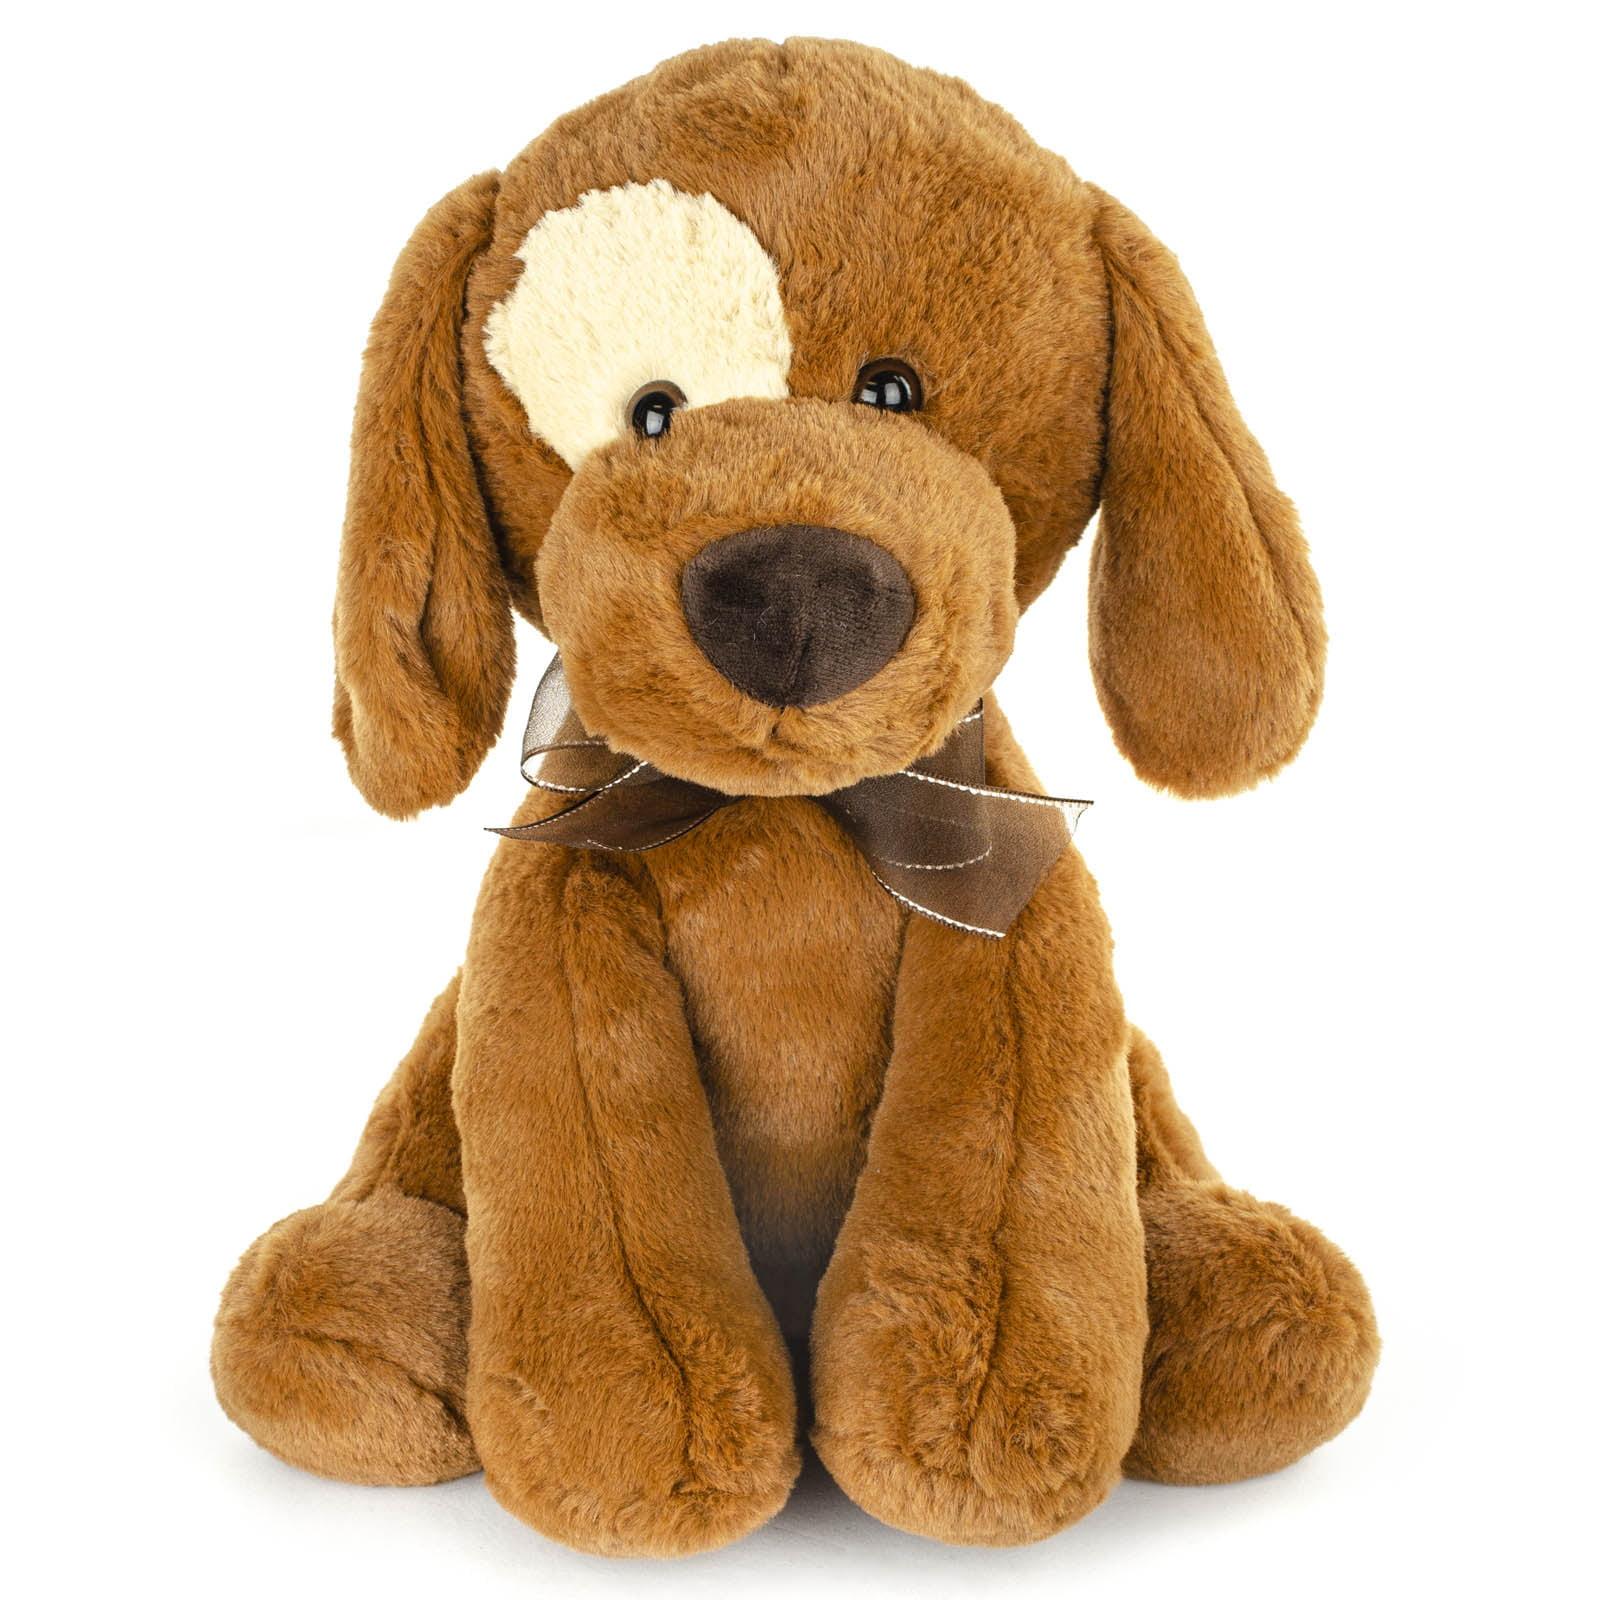 Plush Sitting Eye patch Dog Stuffed Animal Toy, Adorable